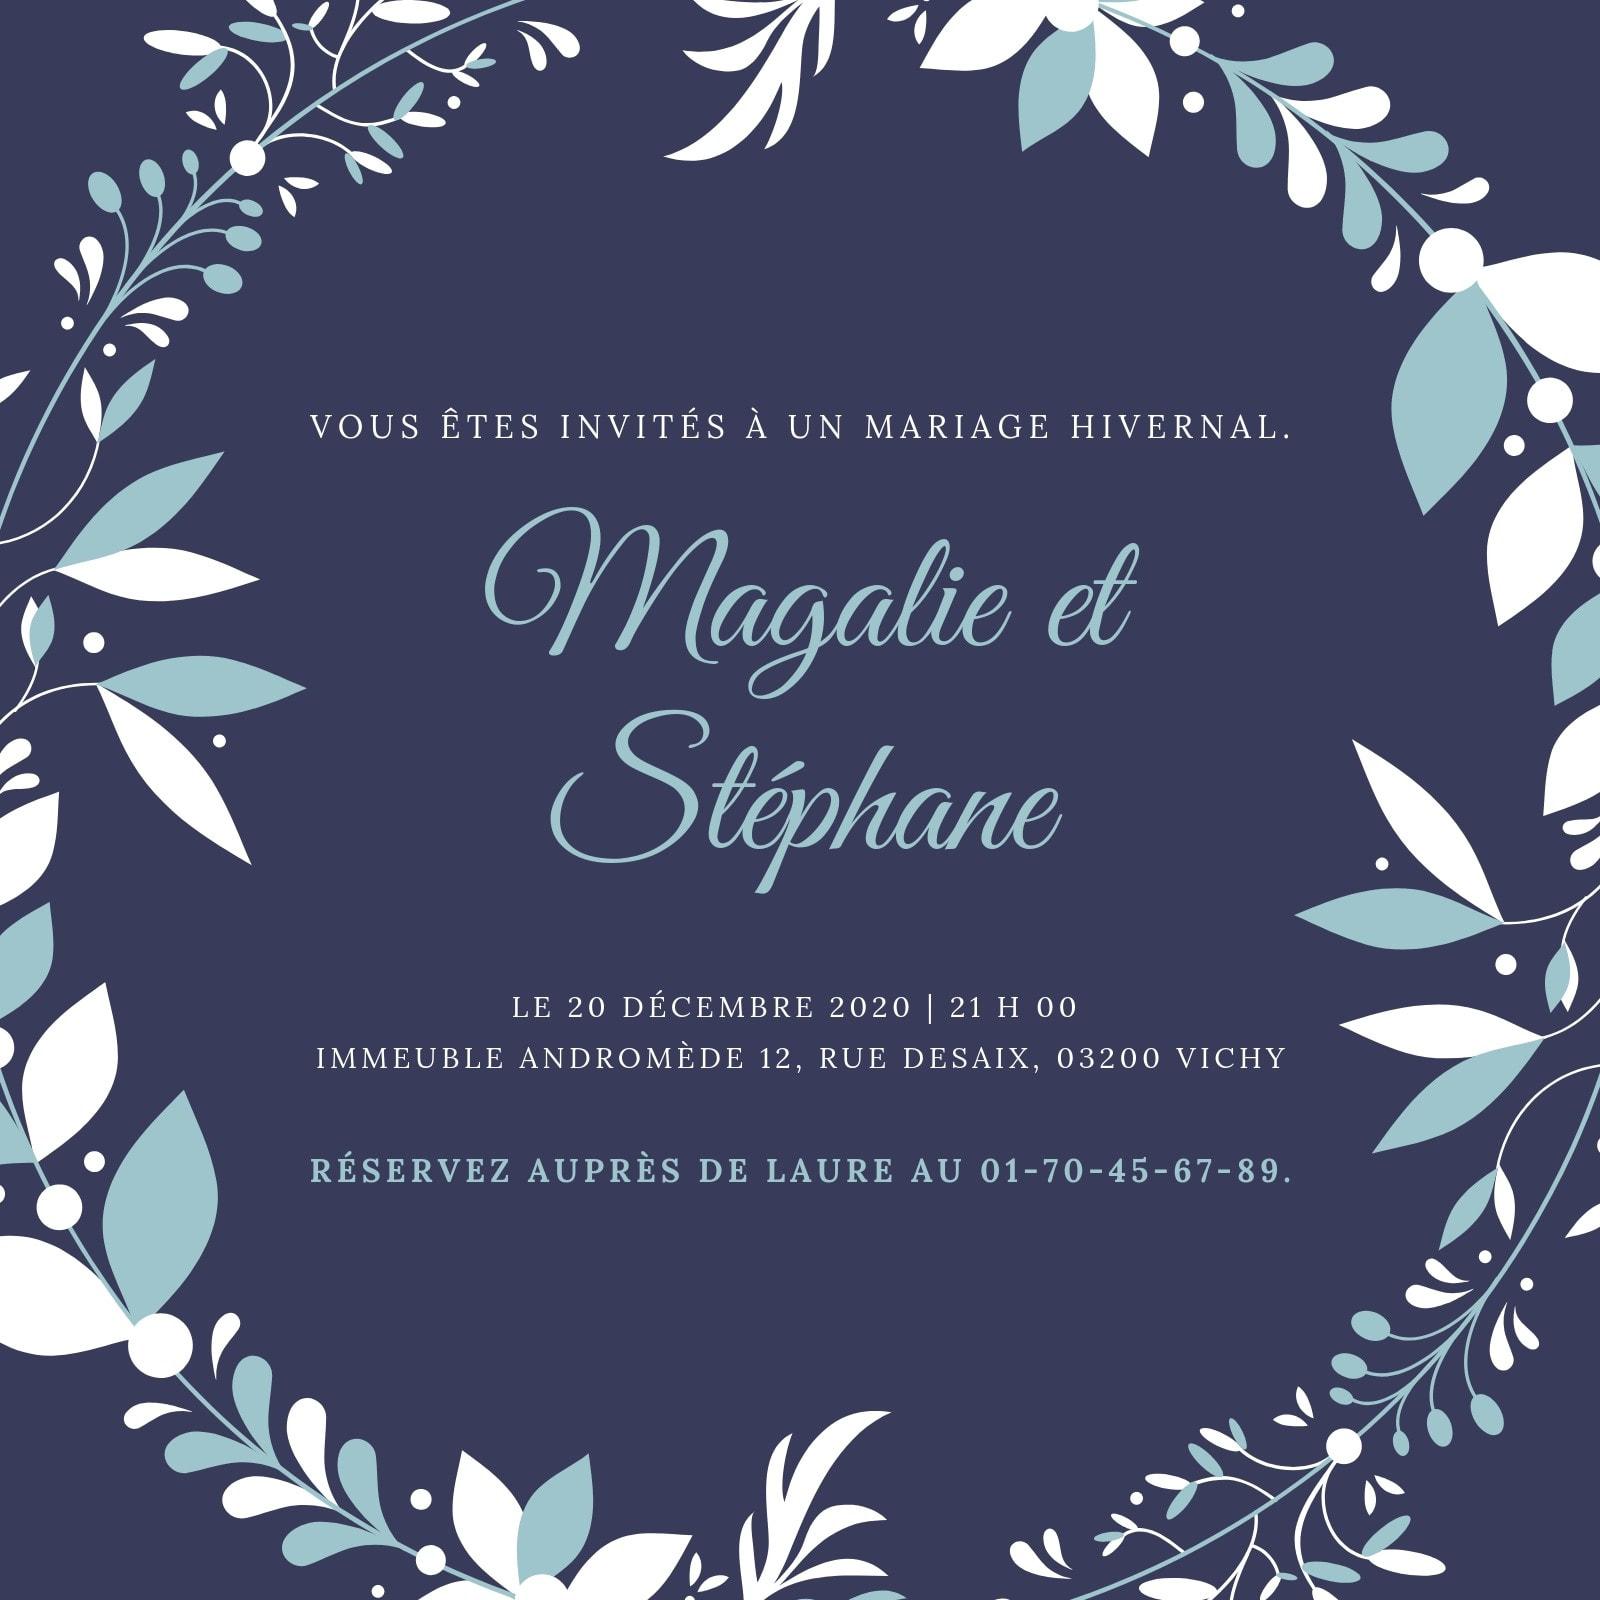 Violet Couronne Hivernal Mariage Invitation